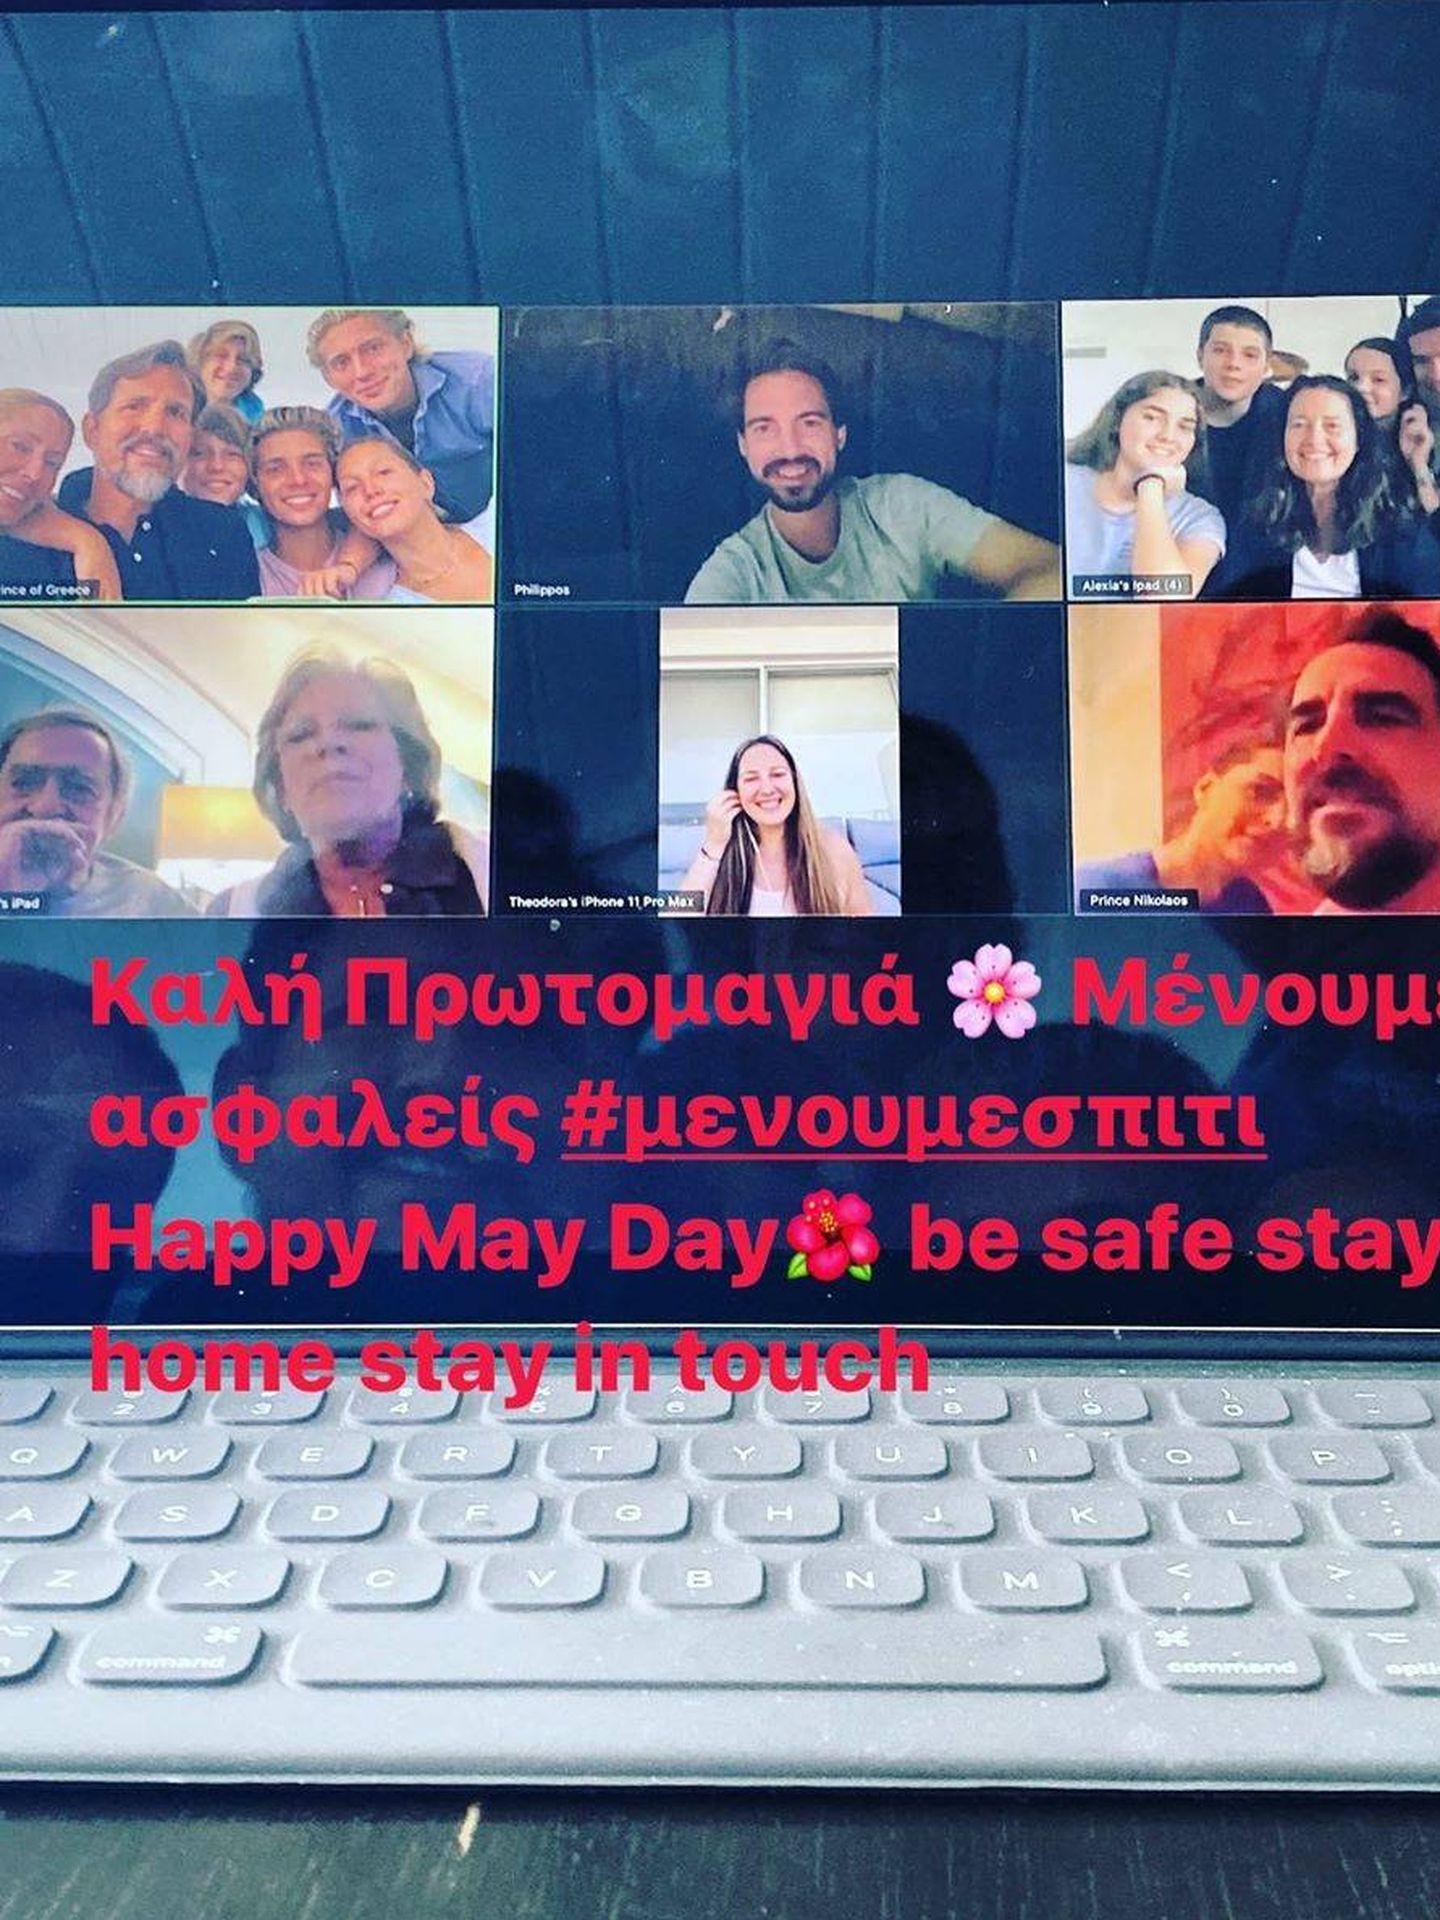 La familia real griega, reunida a través de videollamada. (Instagram: @pavlosgreece)